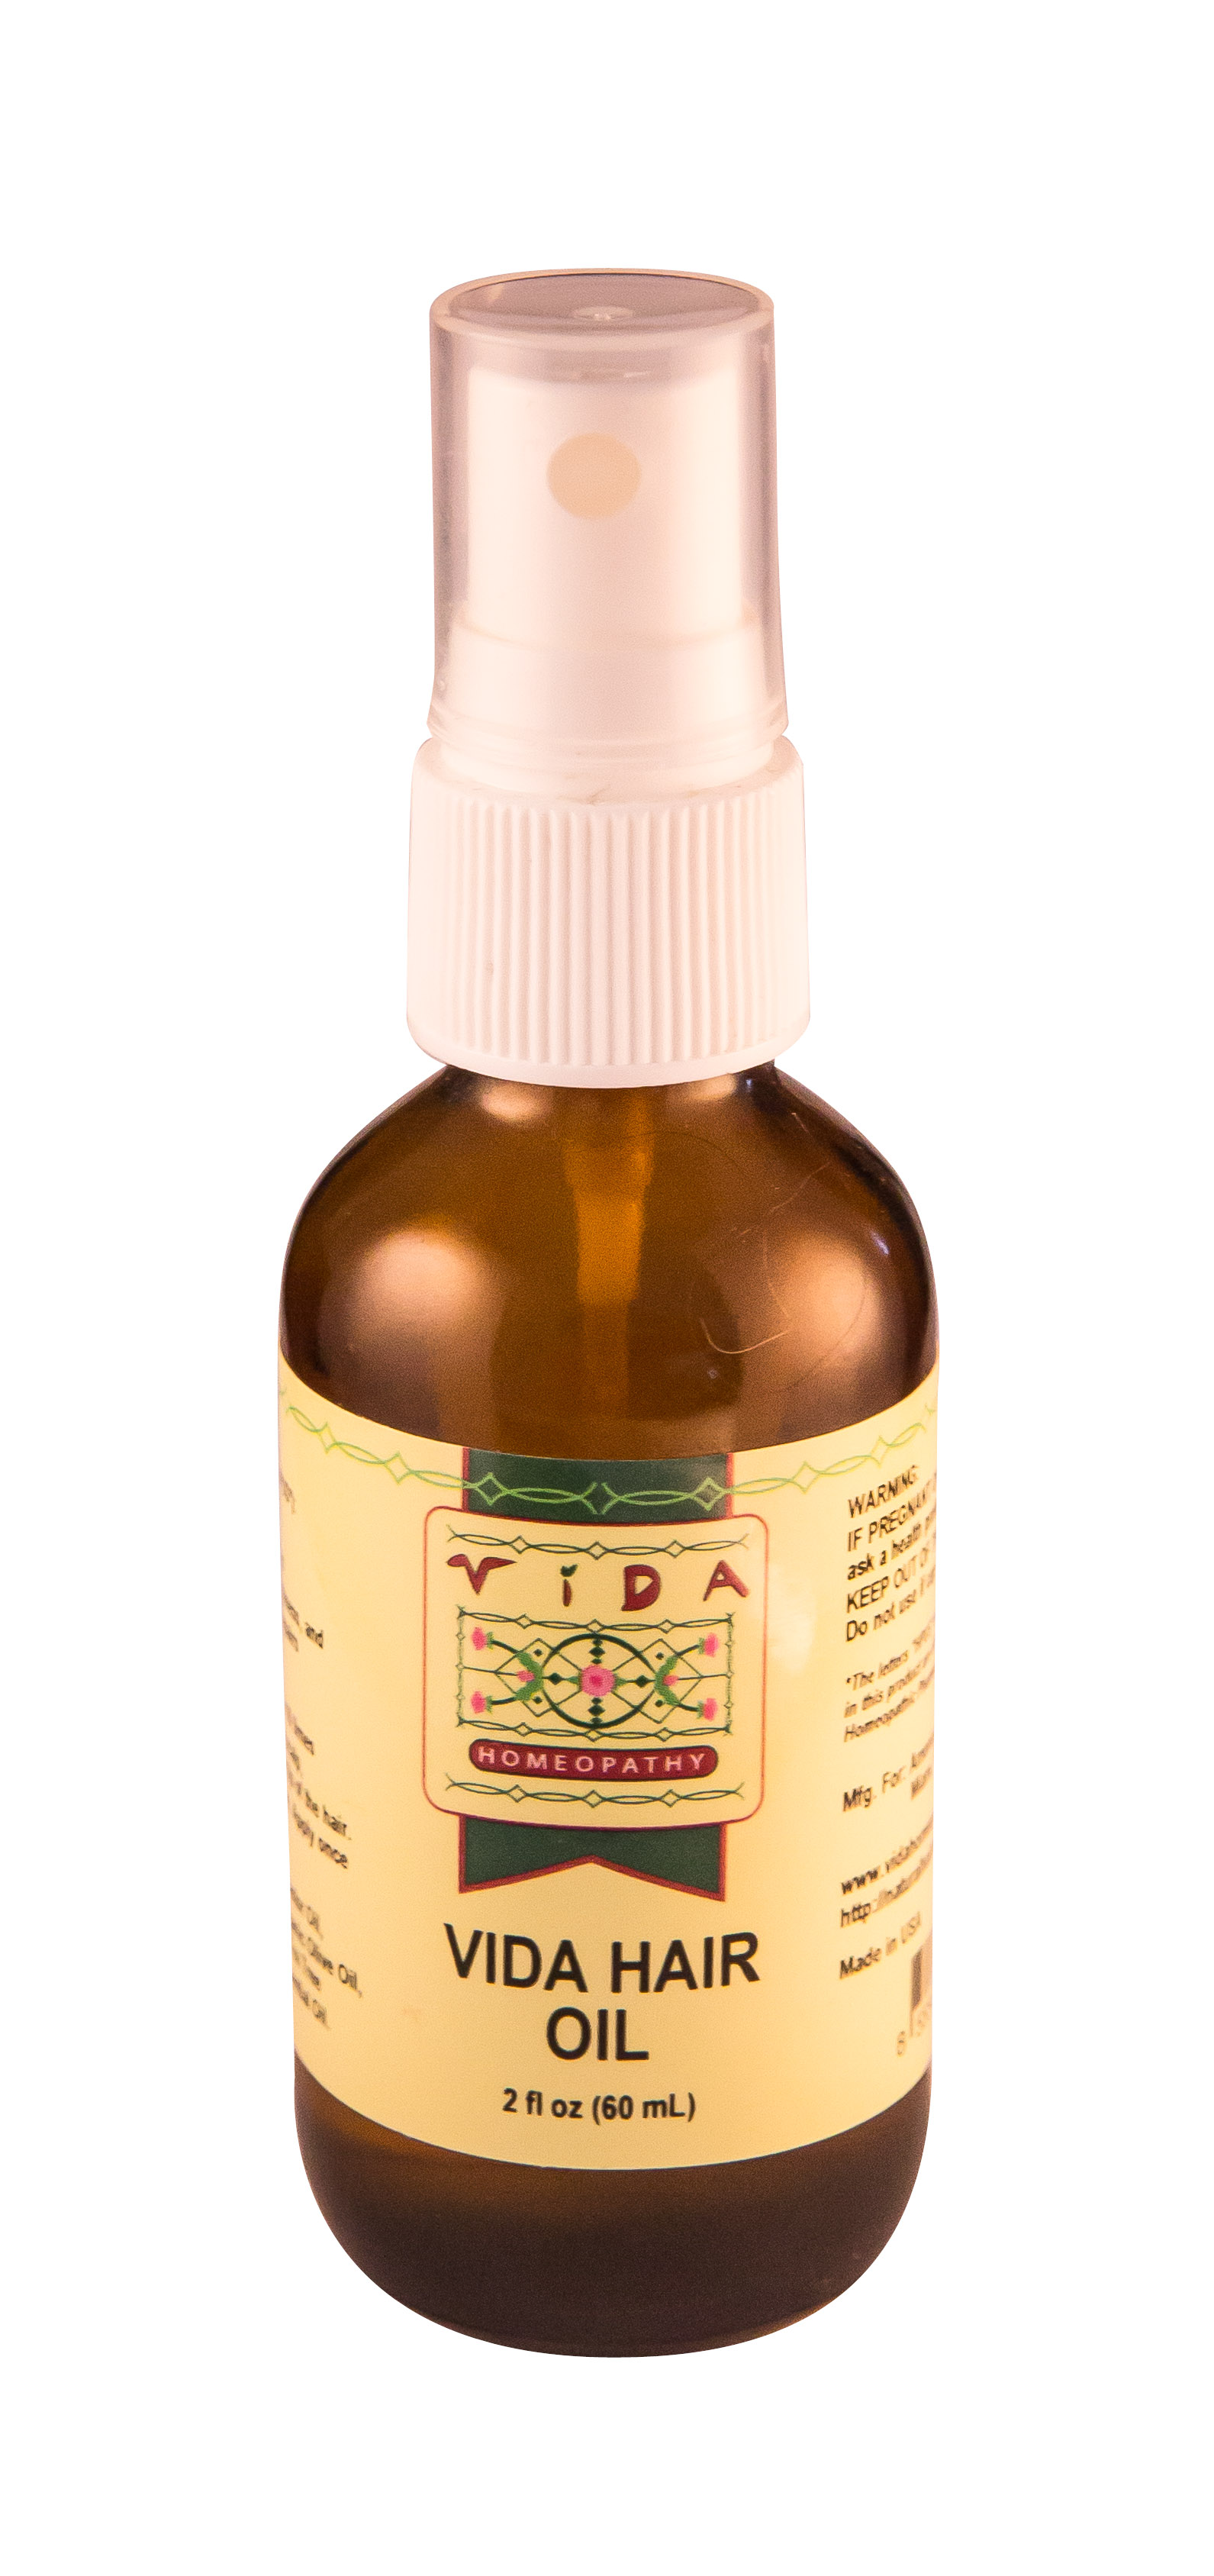 vida-hair-oil-1.1.jpg